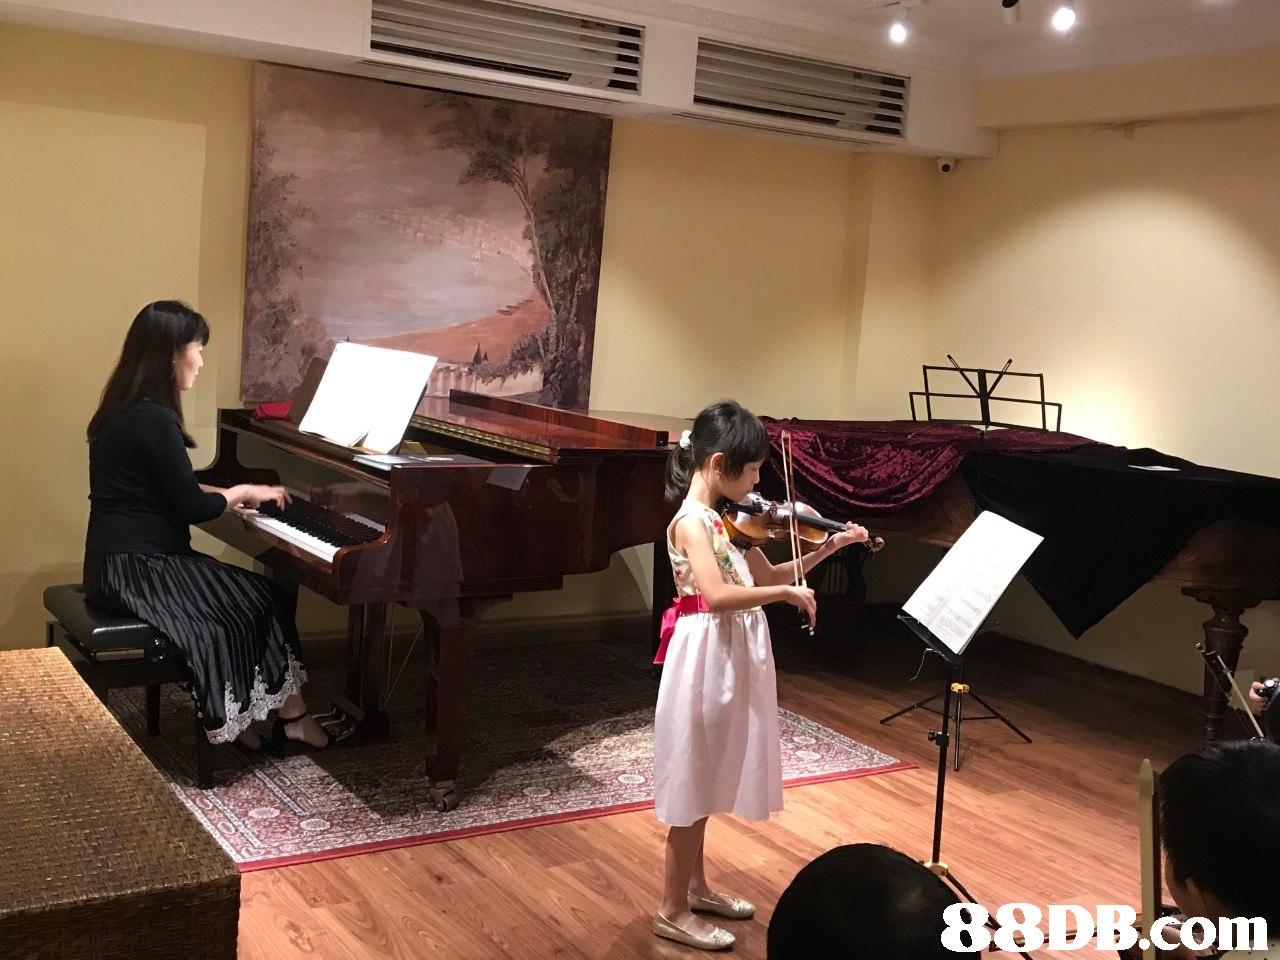 88DB.conm  Recital,Pianist,Musical instrument,Music,Piano